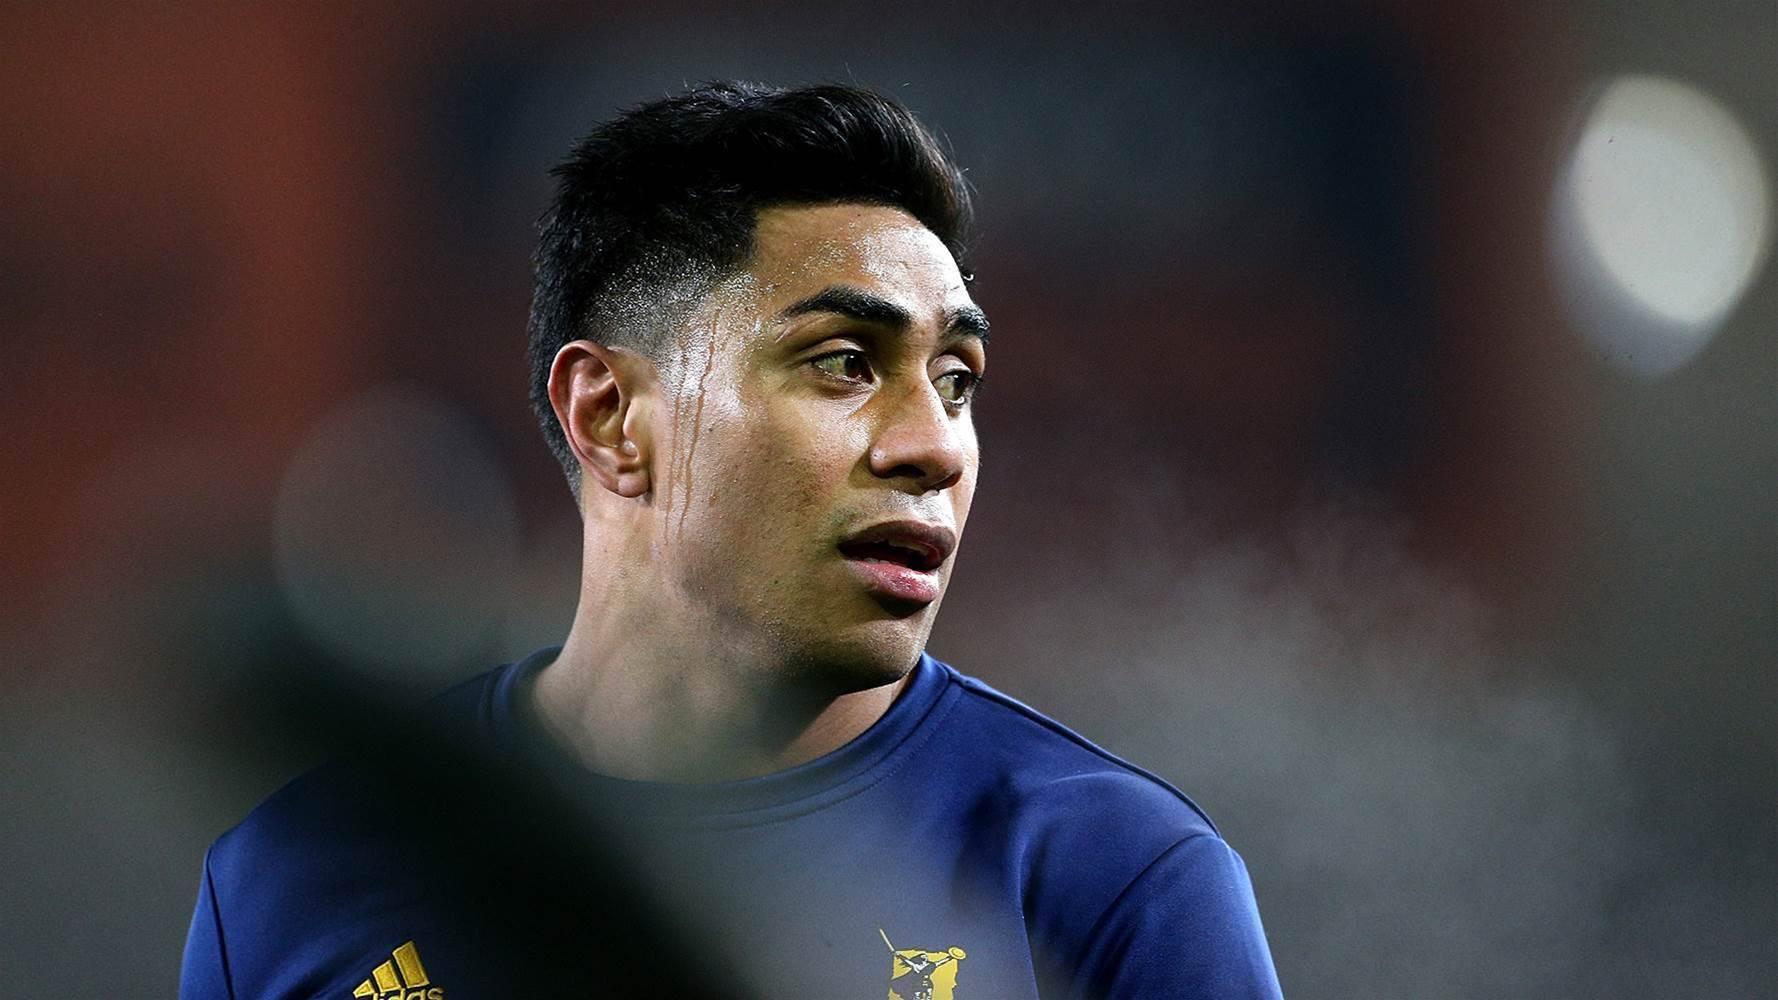 Fekitoa confirms Toulon move